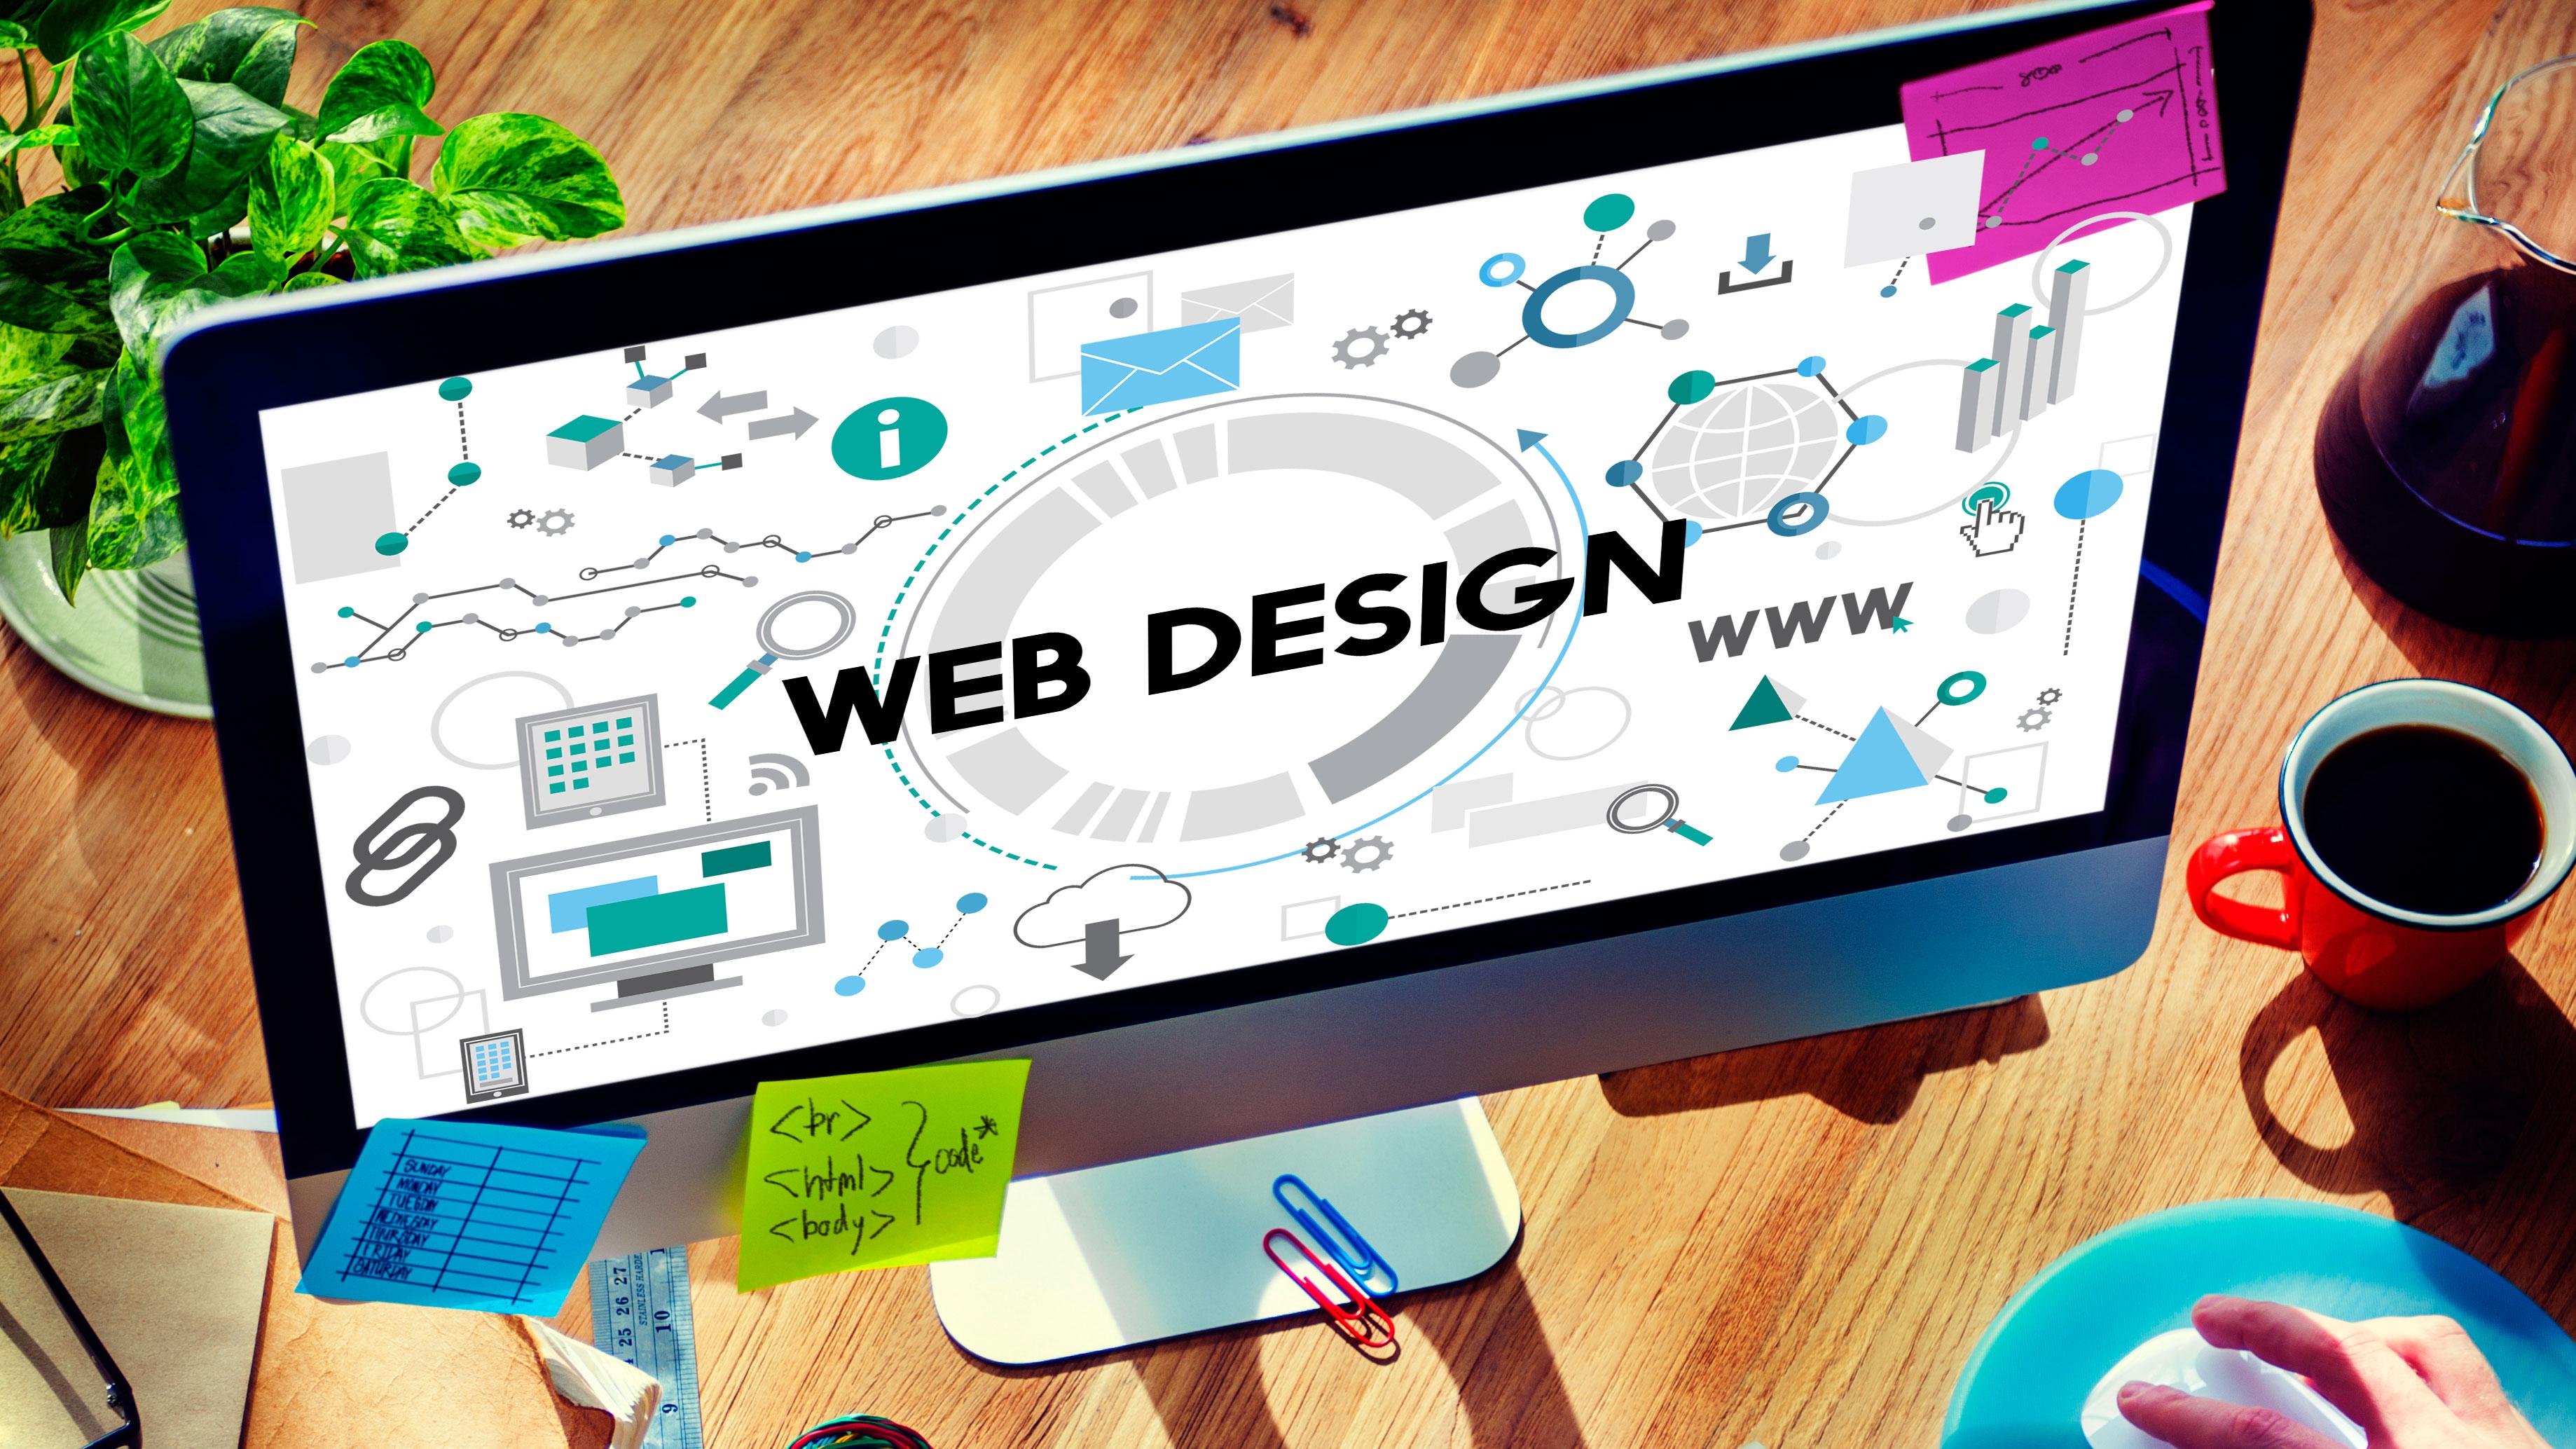 DFT40043 WEB DESIGN TECHNOLOGY